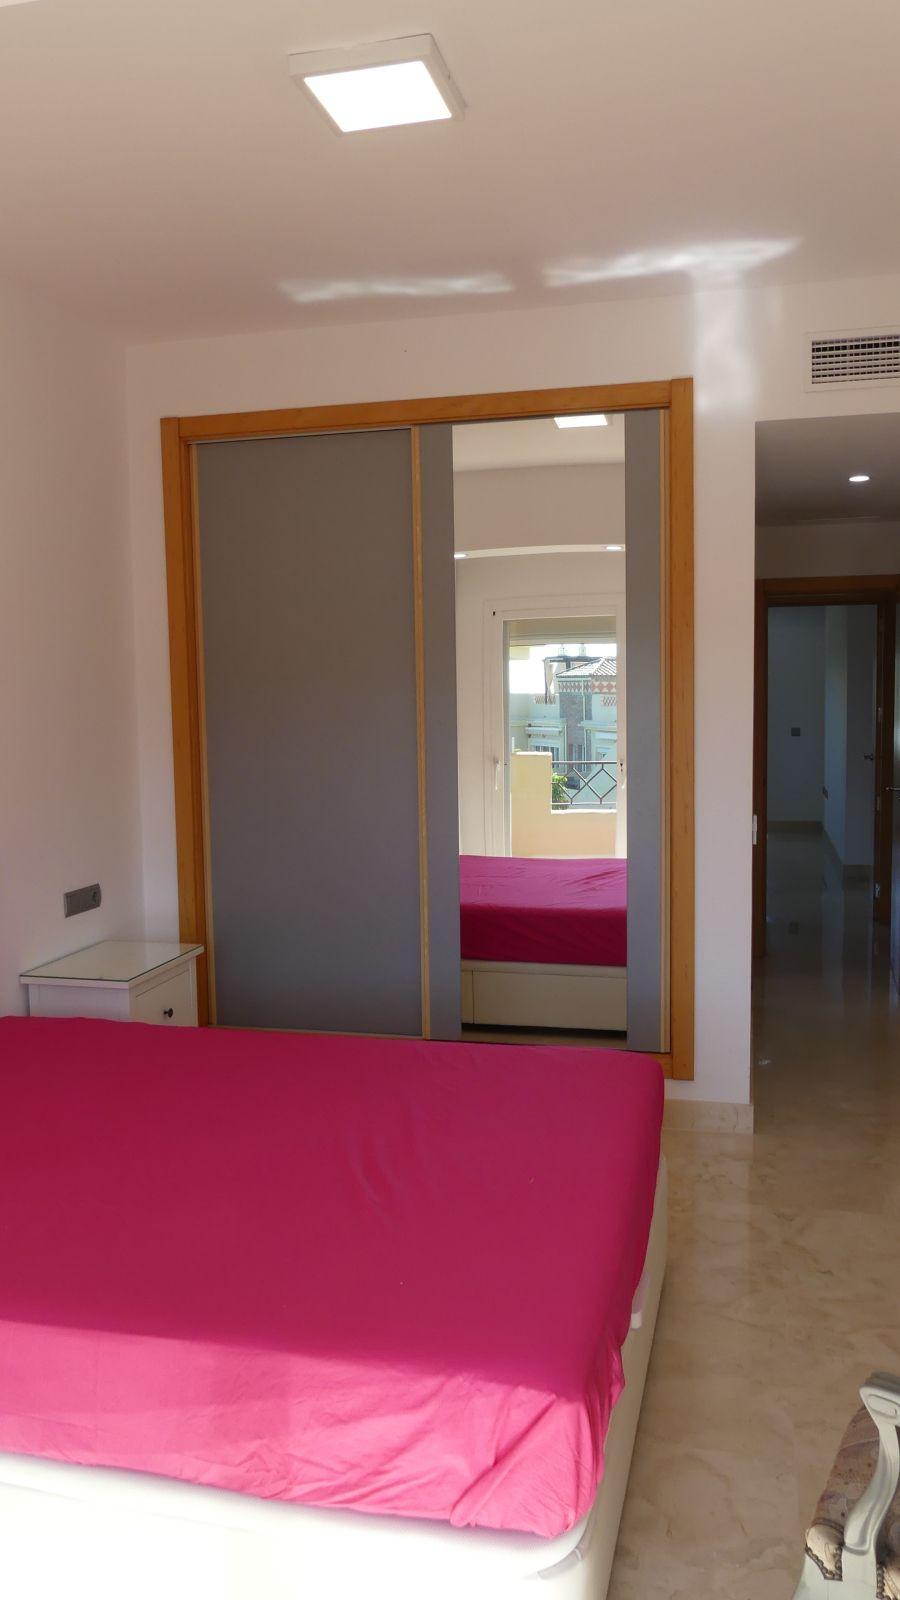 2 Bedroom Apartment For Sale, Benahavís